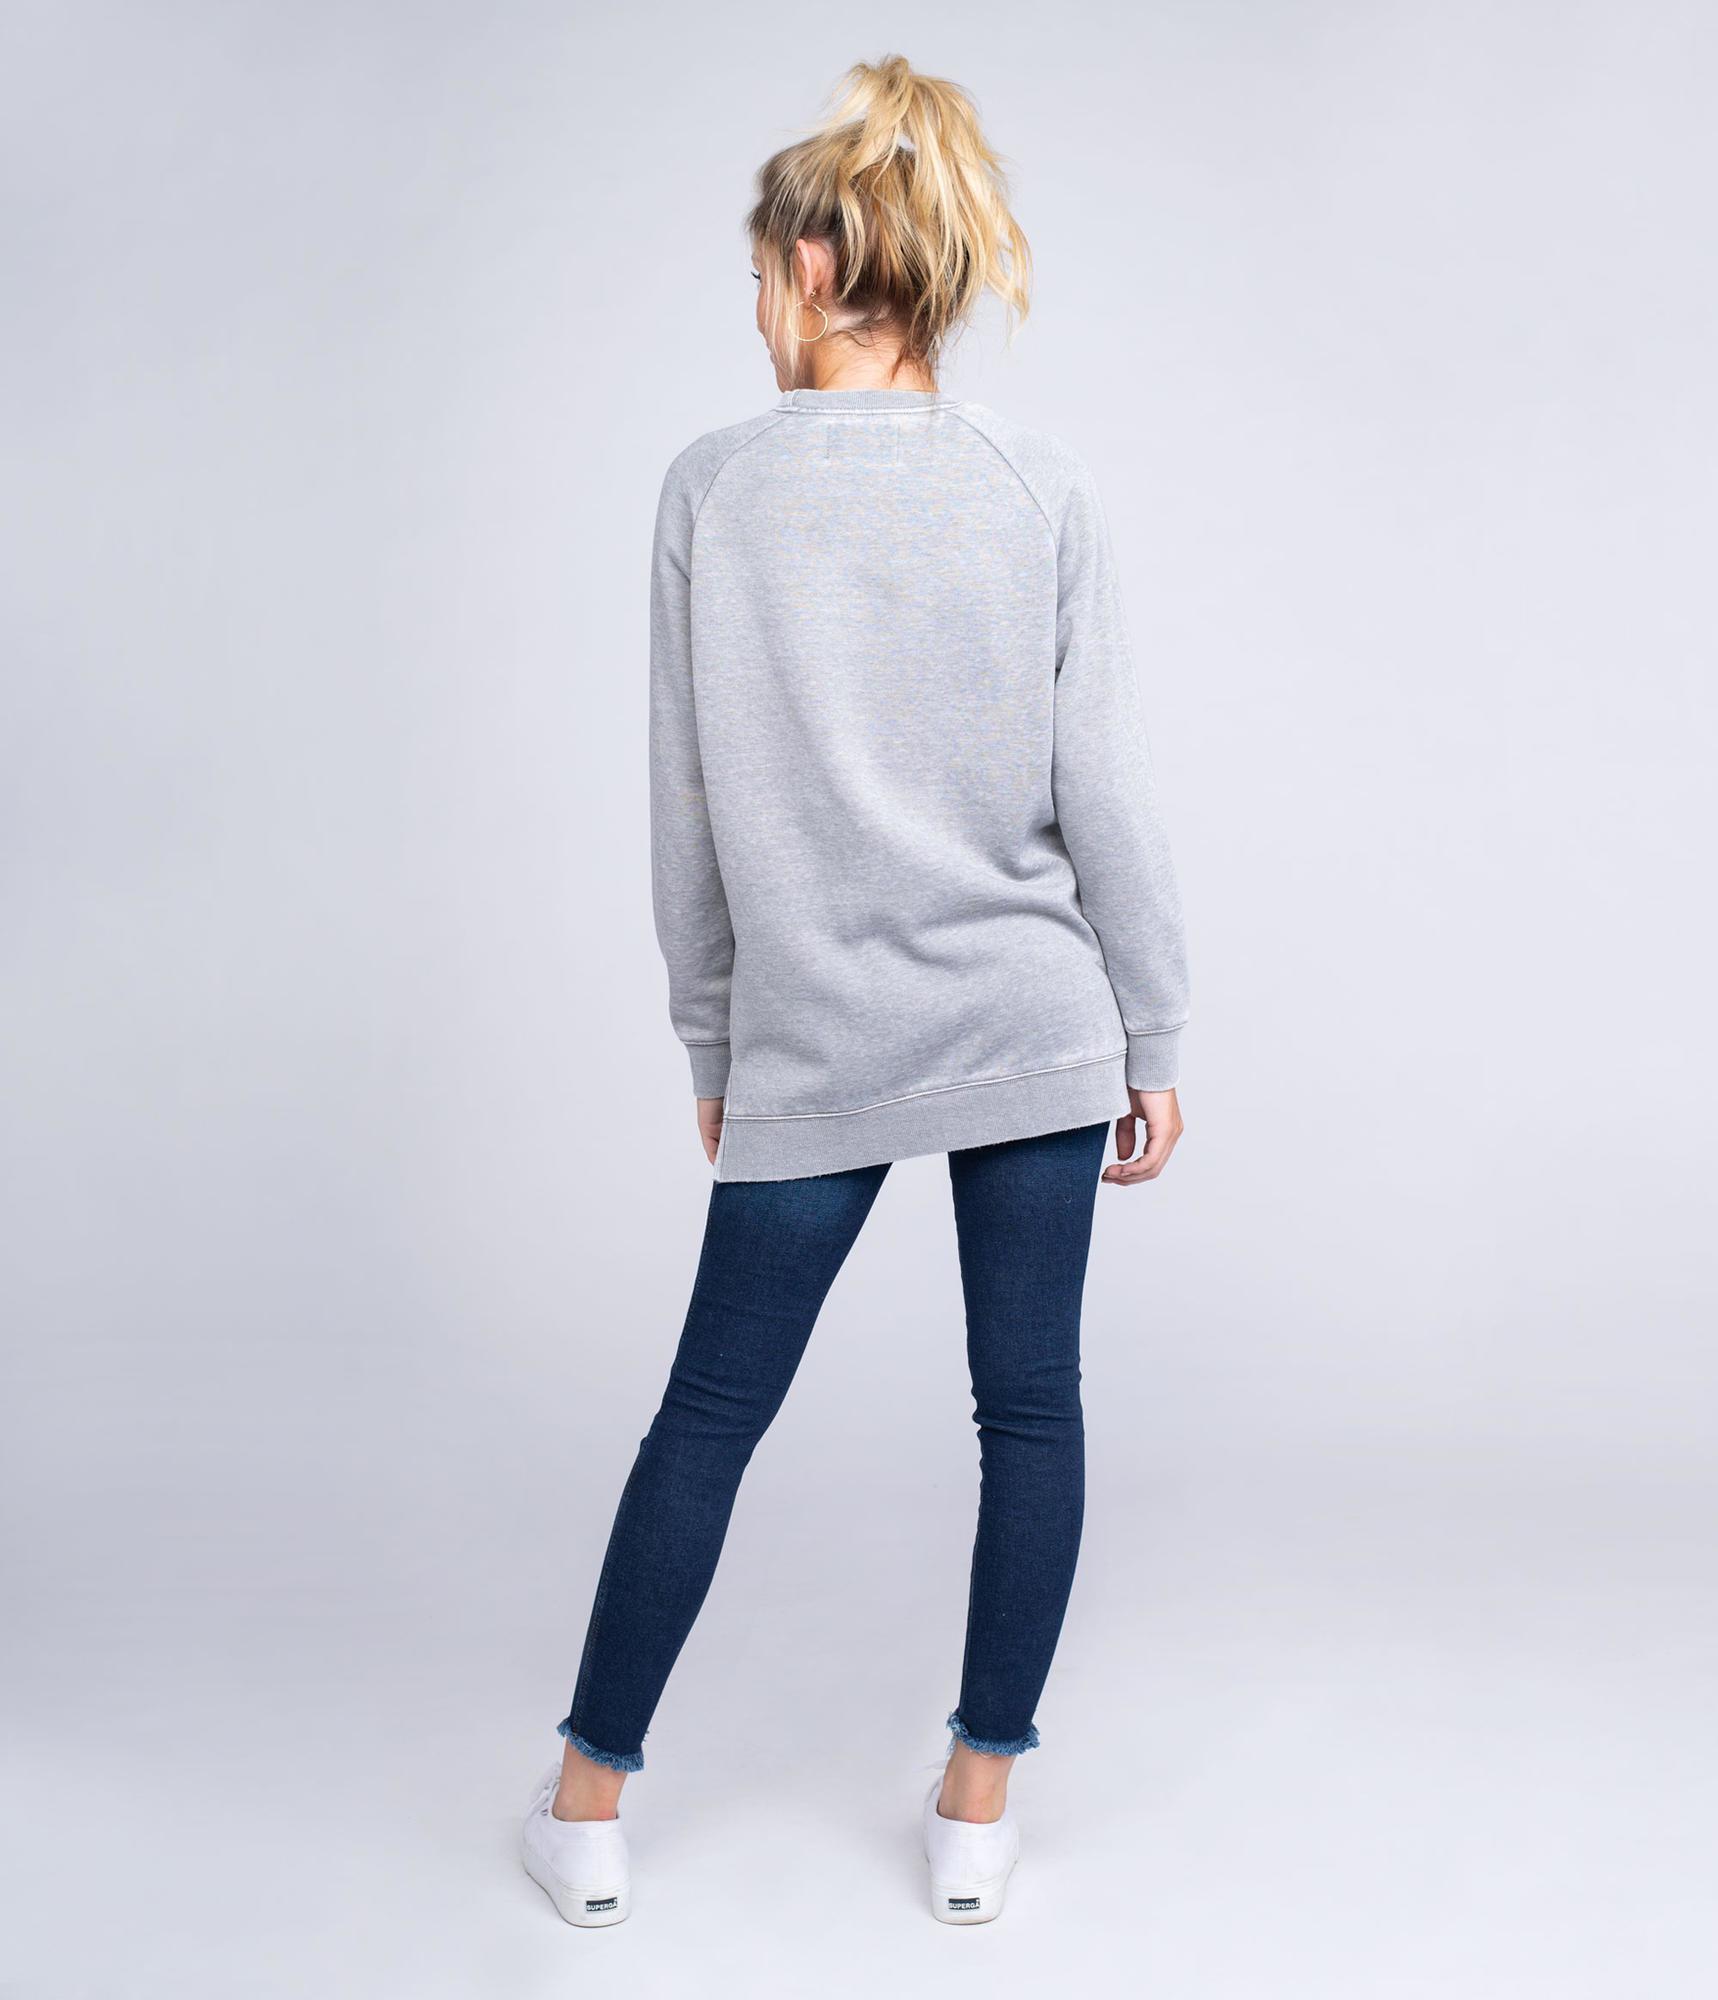 Southern Shirt Velveteen Sweatshirt